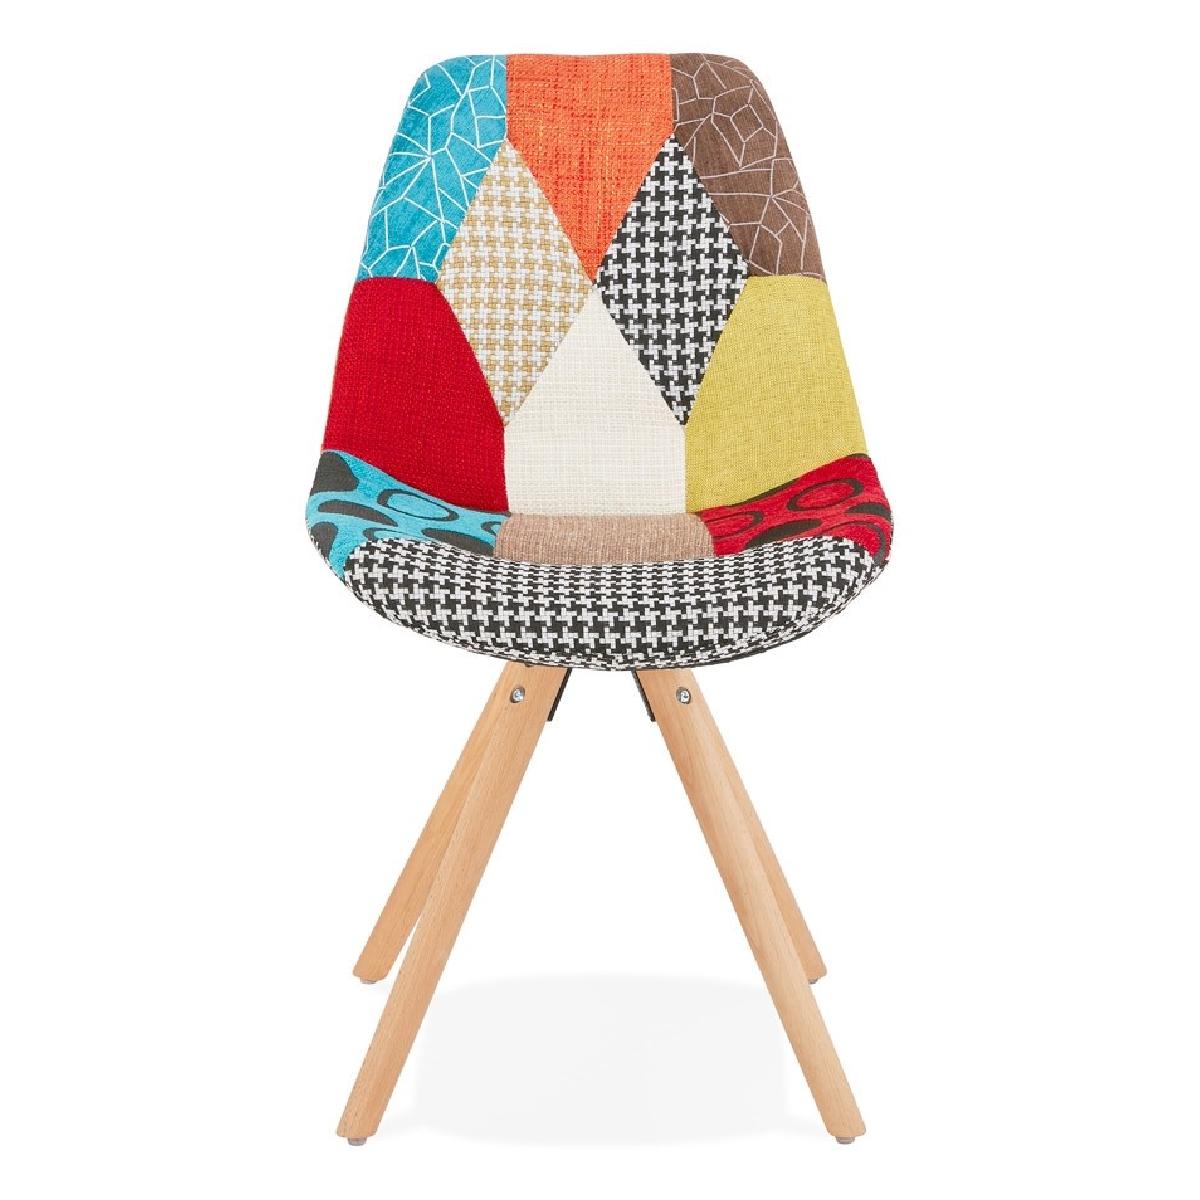 fauteuil bois scandinave. Black Bedroom Furniture Sets. Home Design Ideas